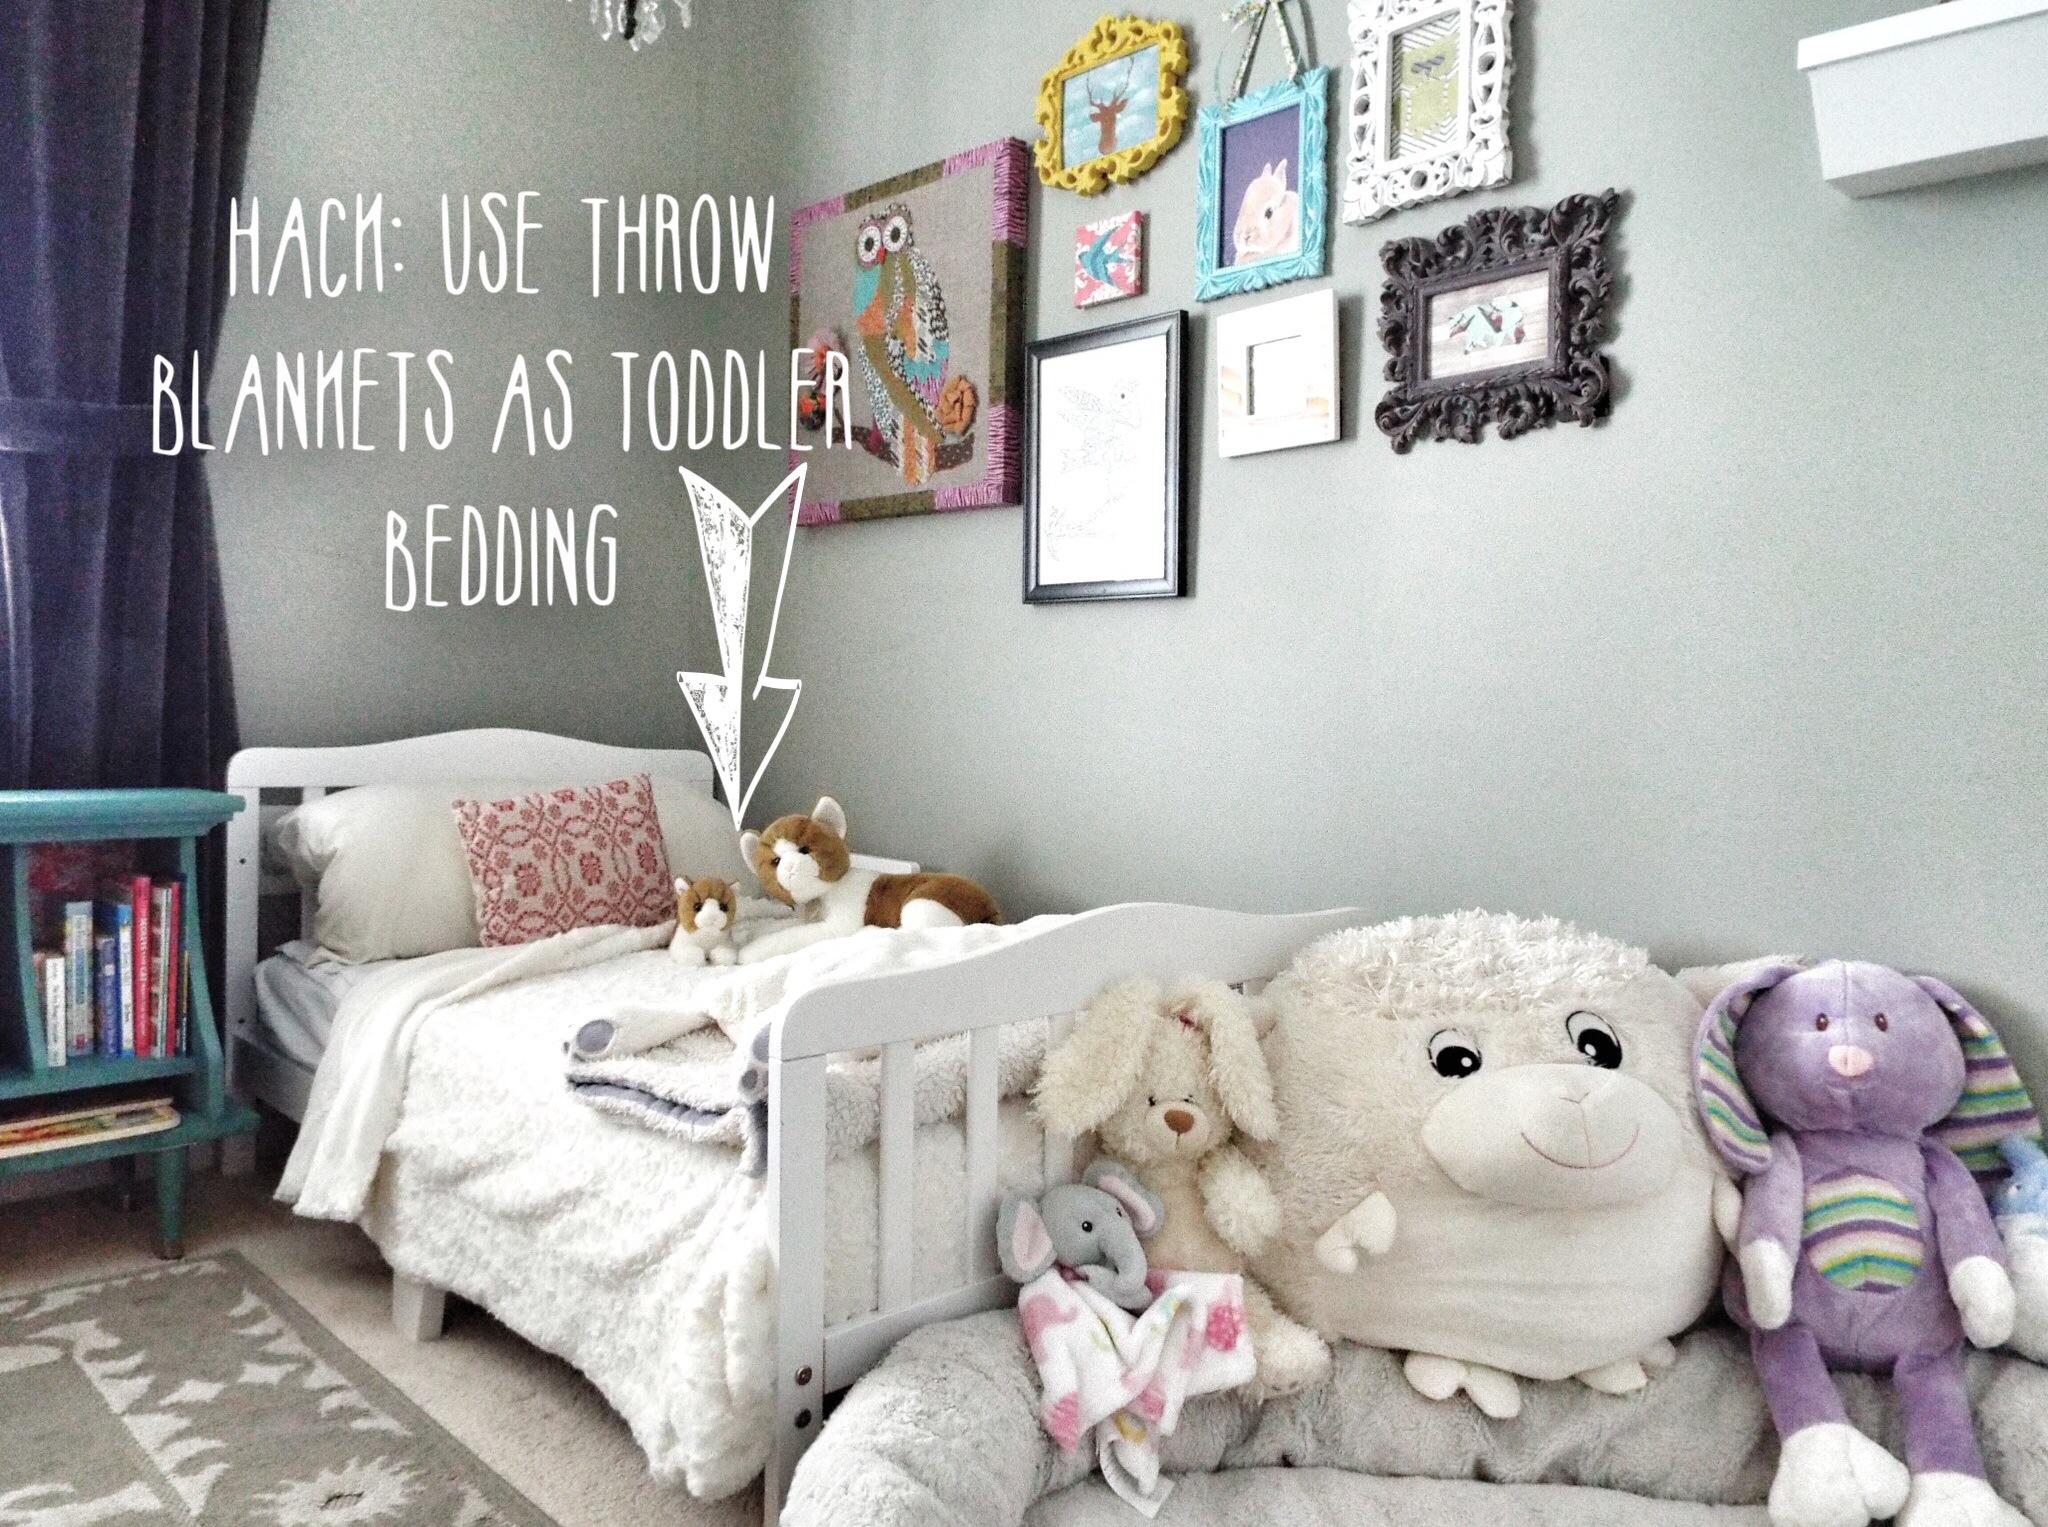 clara's bedding